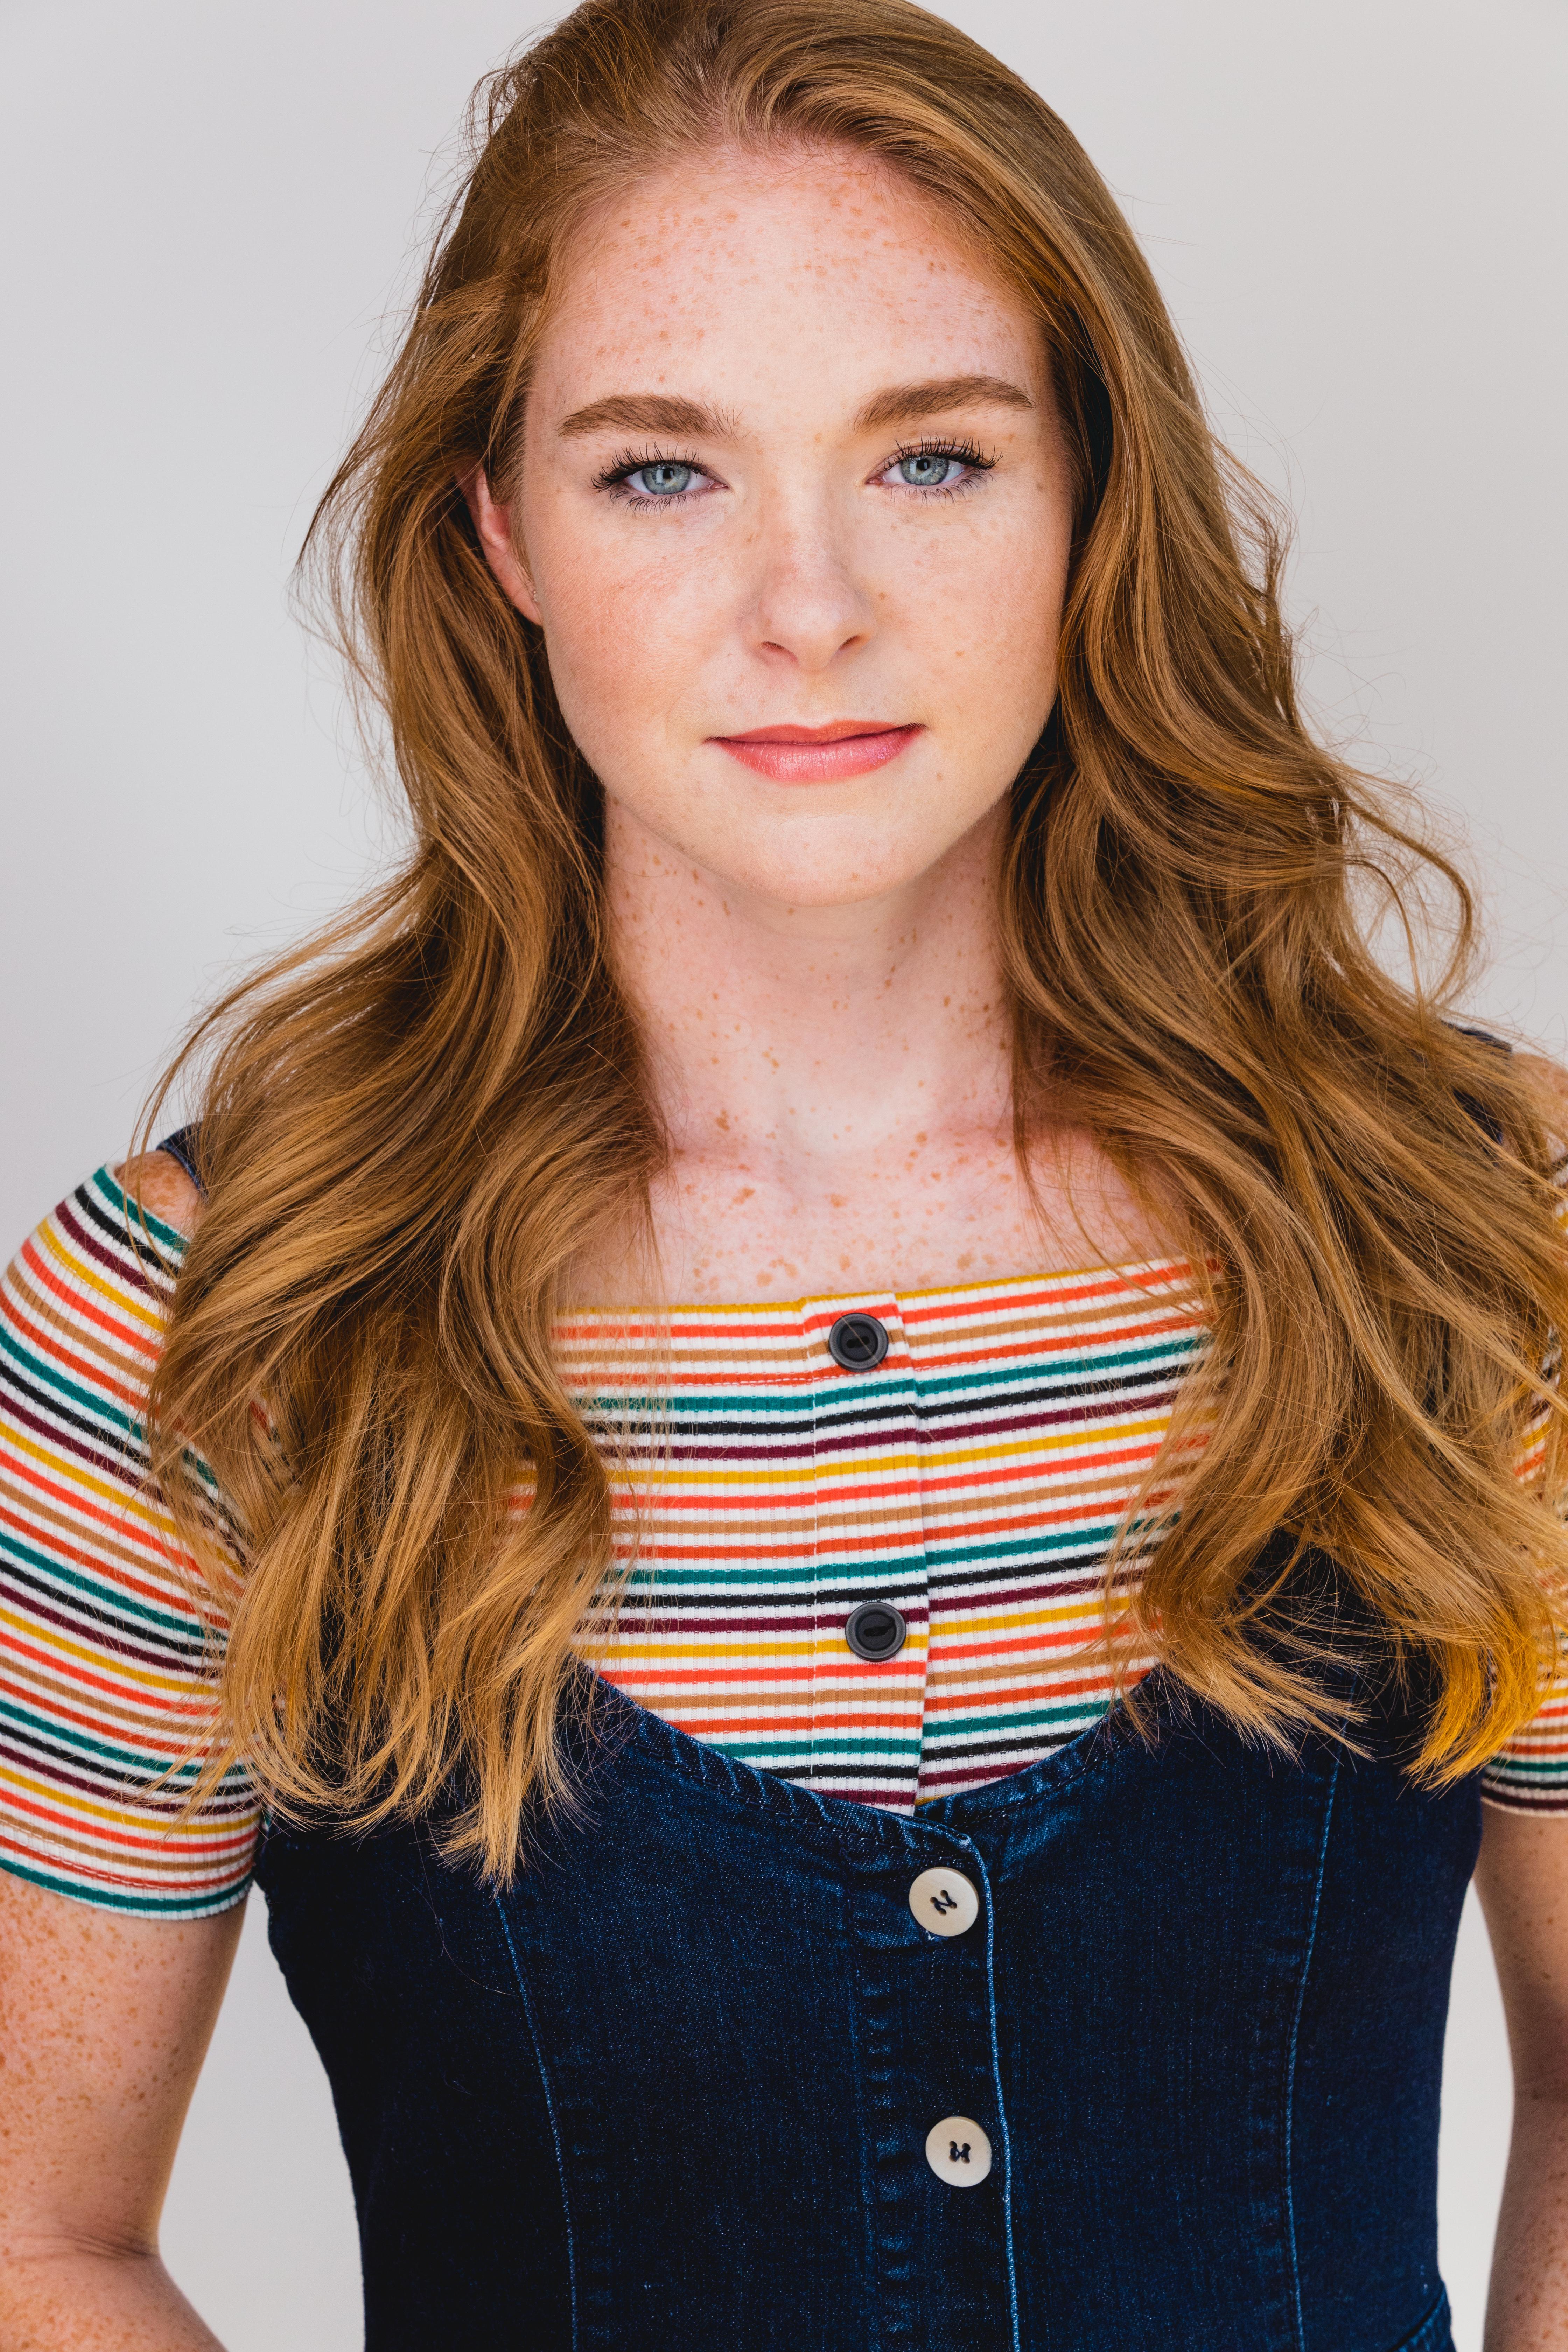 Brittani O'Connell Headshot 4